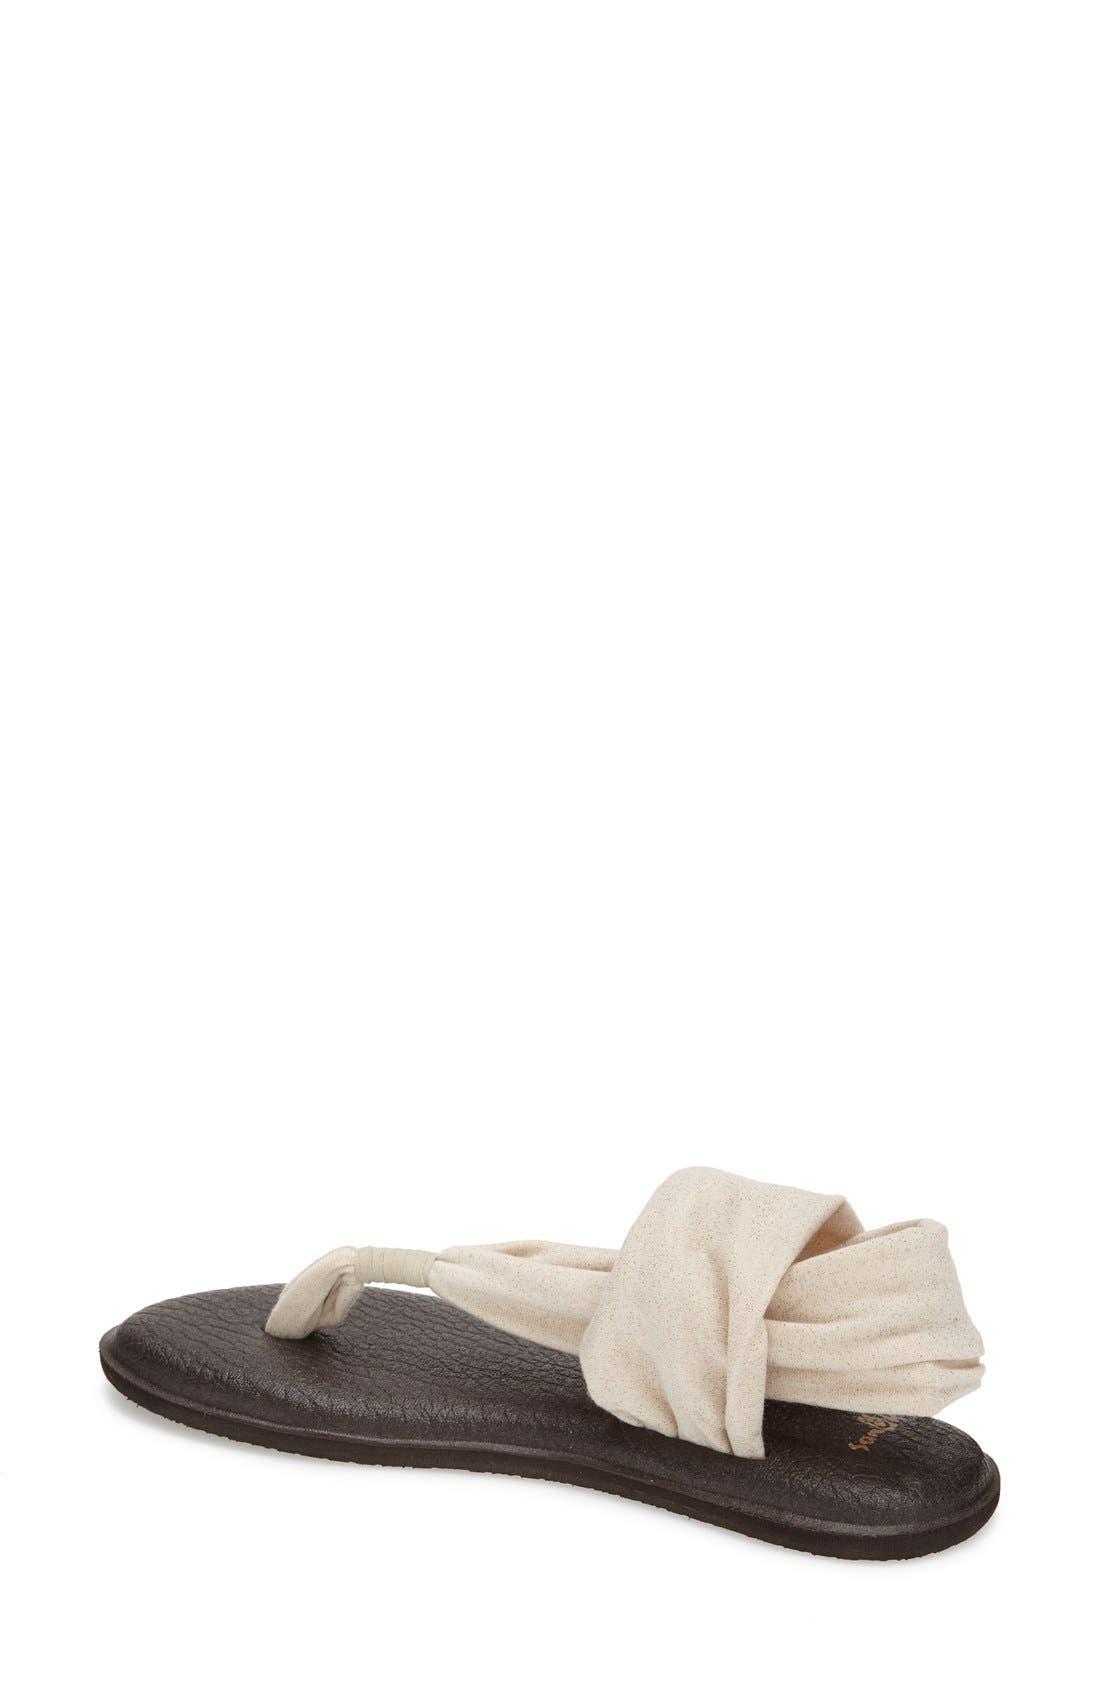 Alternate Image 2  - Sanuk 'Yoga Metallic Sling' Sandal (Women)